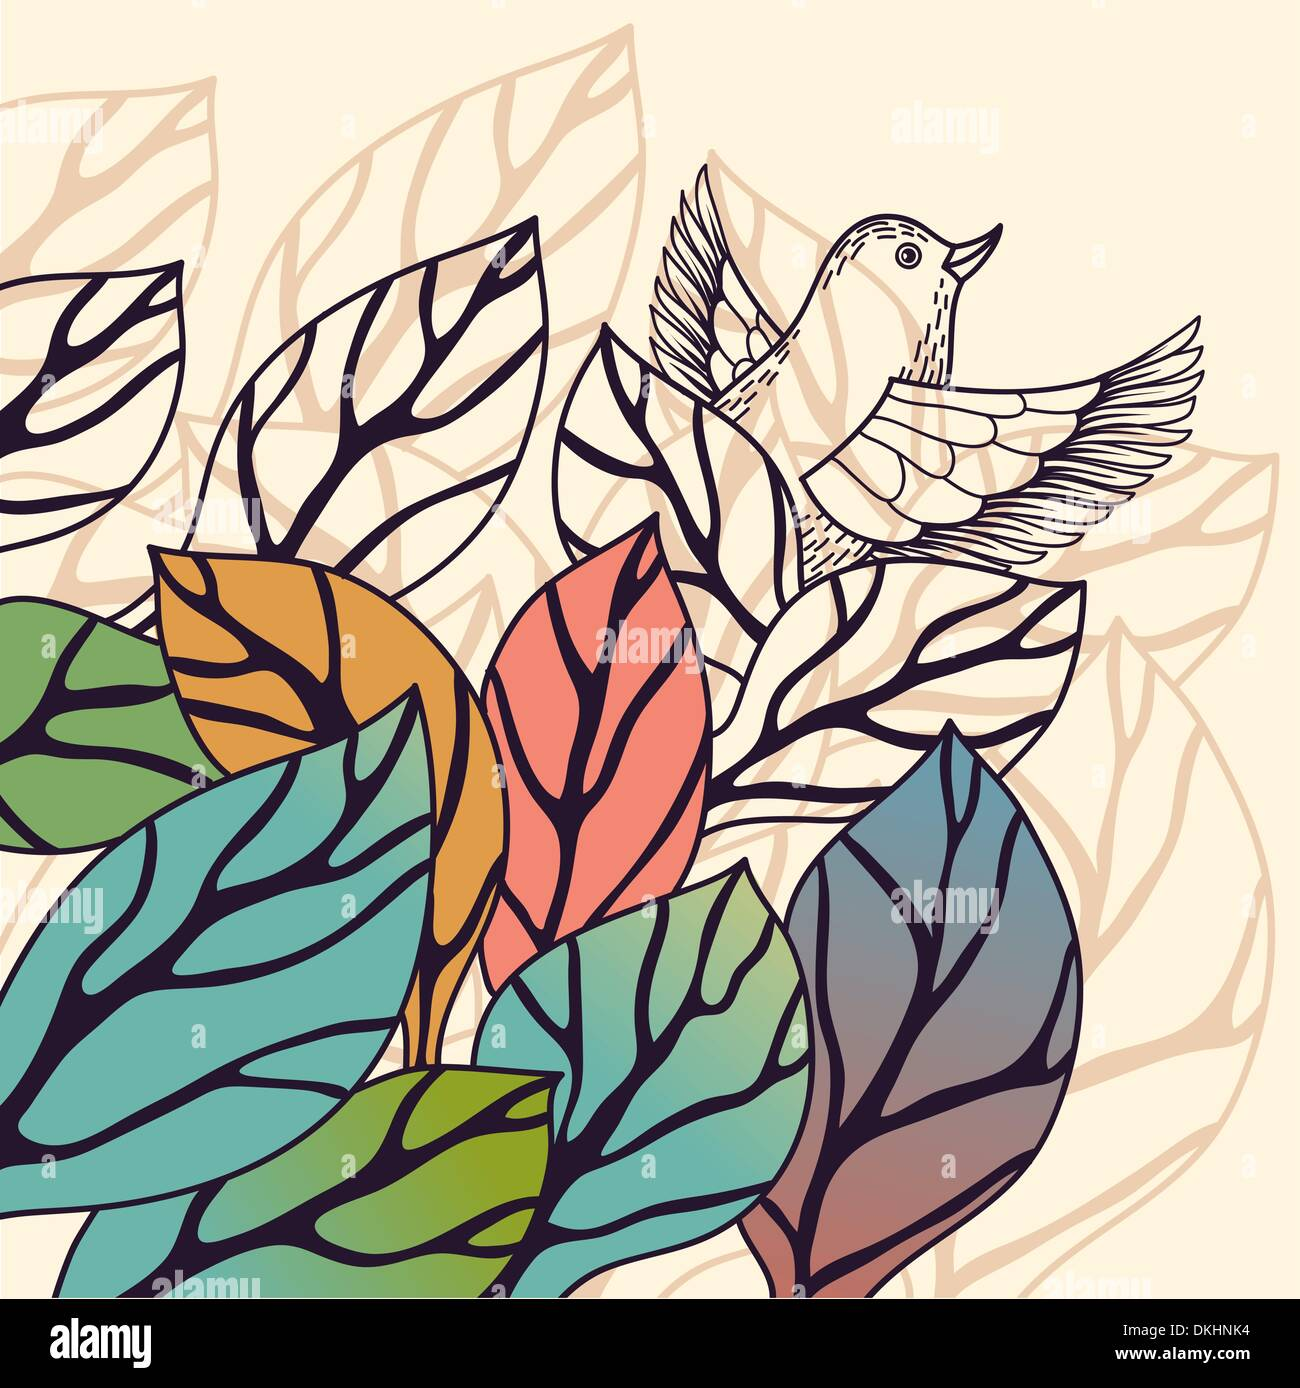 Vektor-Natur-Hintergrund mit bunten Blättern Stockbild